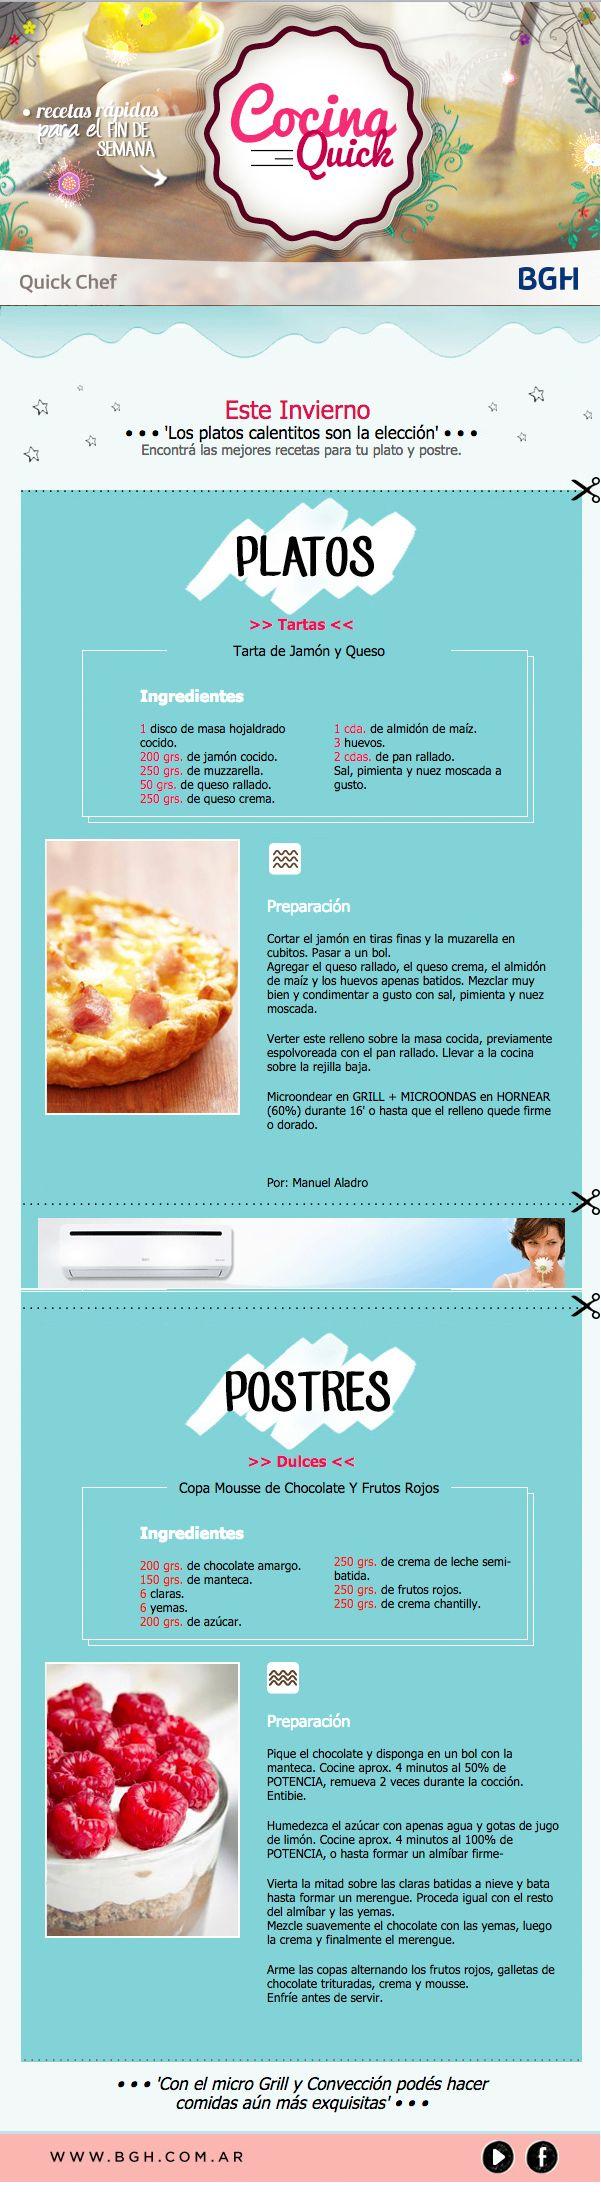 Tarta y Postre!